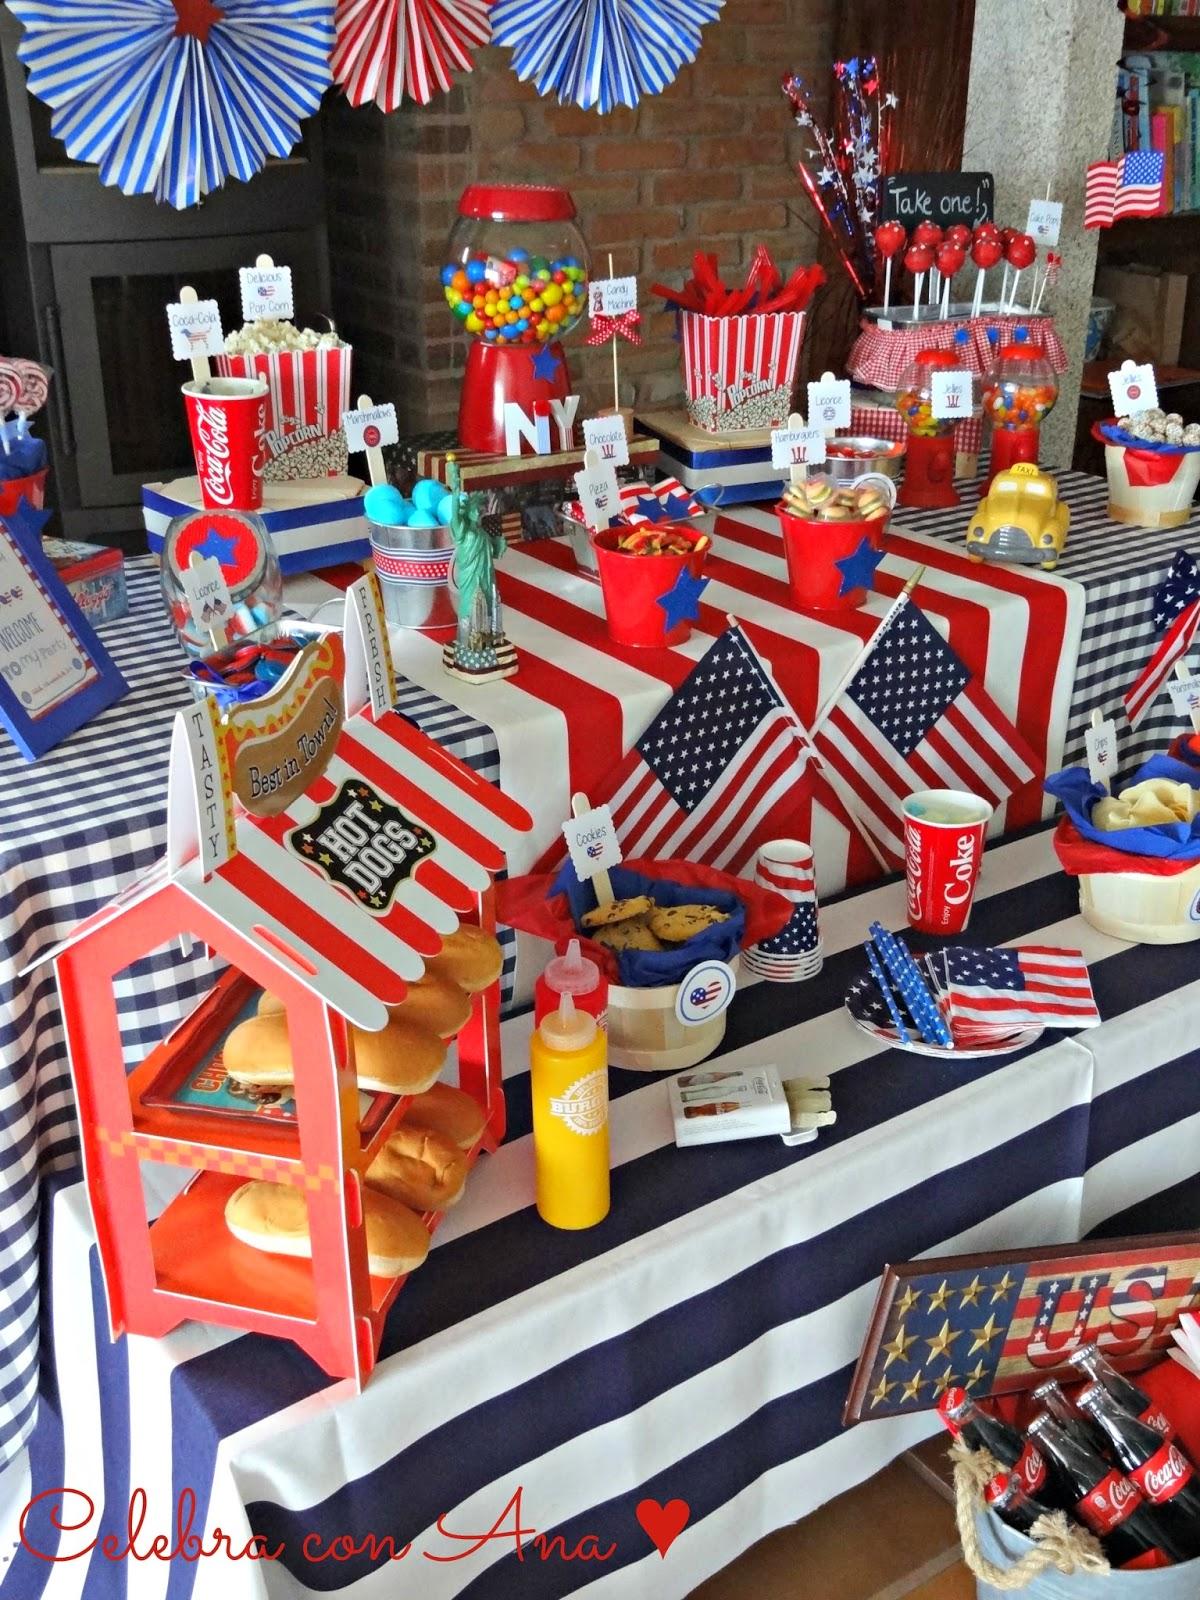 Celebra con ana compartiendo experiencias creativas usa - Decoracion retro americana ...